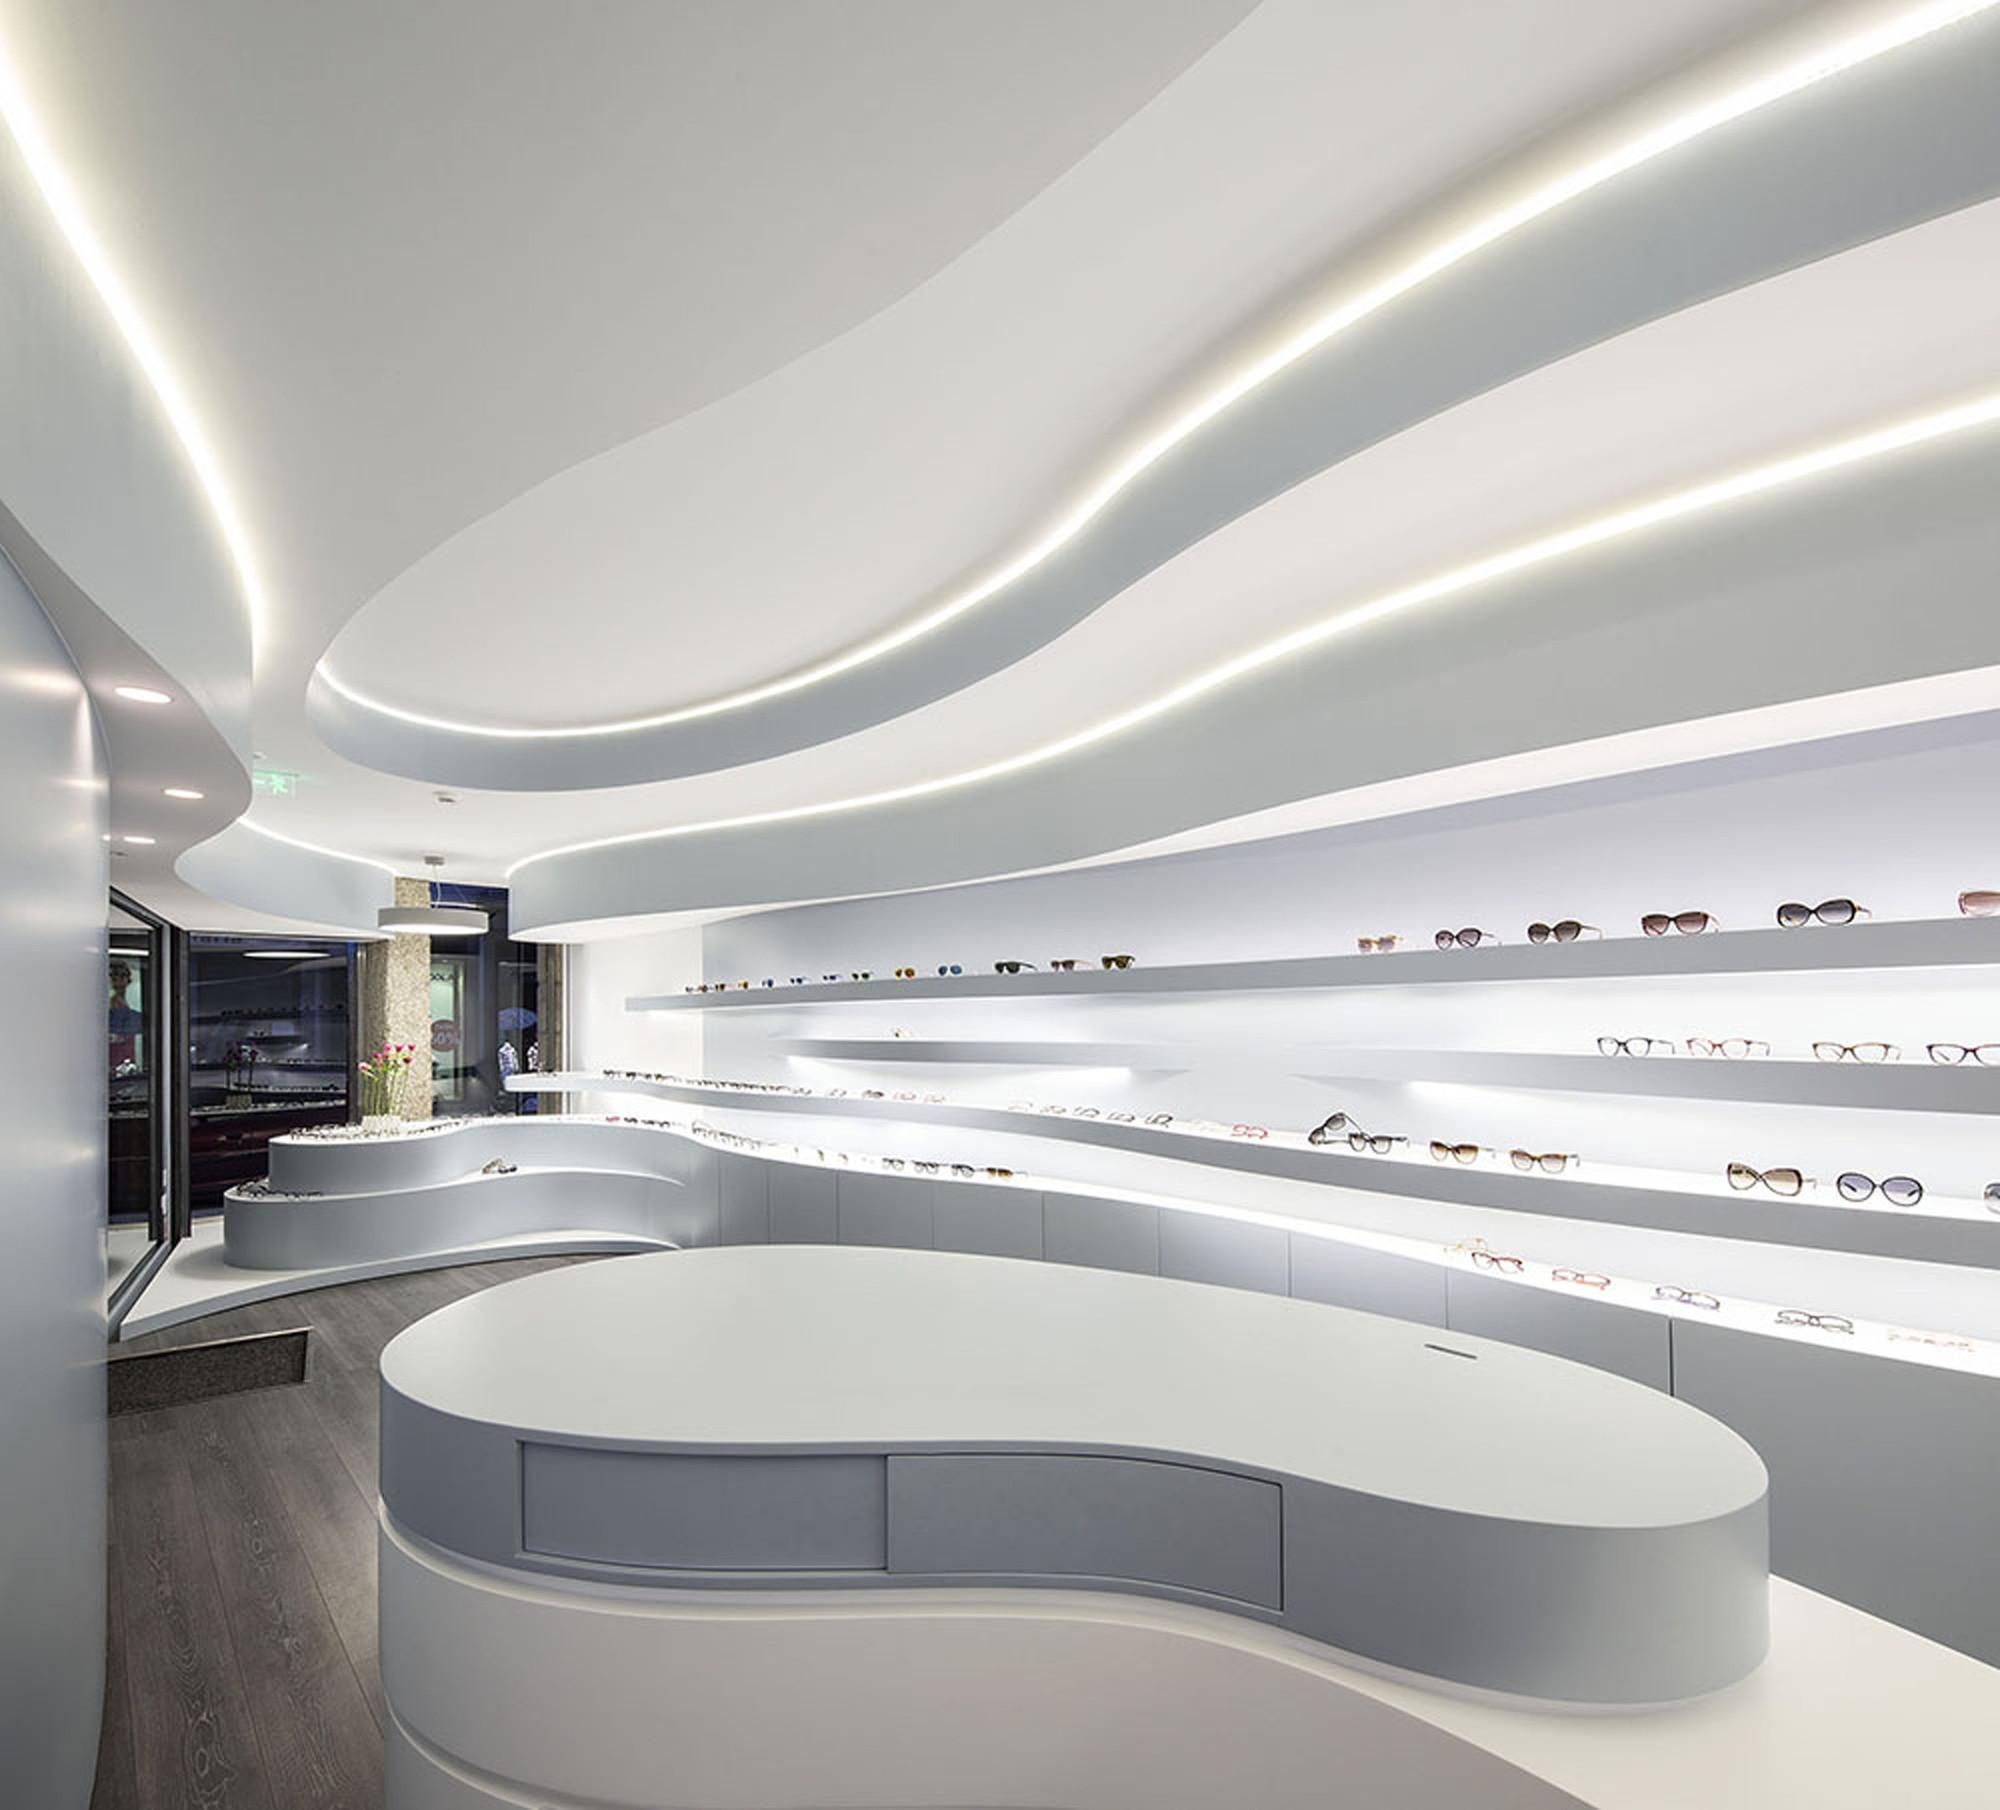 Gallery of novaoptica optic store tsou arquitectos 7 for Optical store designs interior